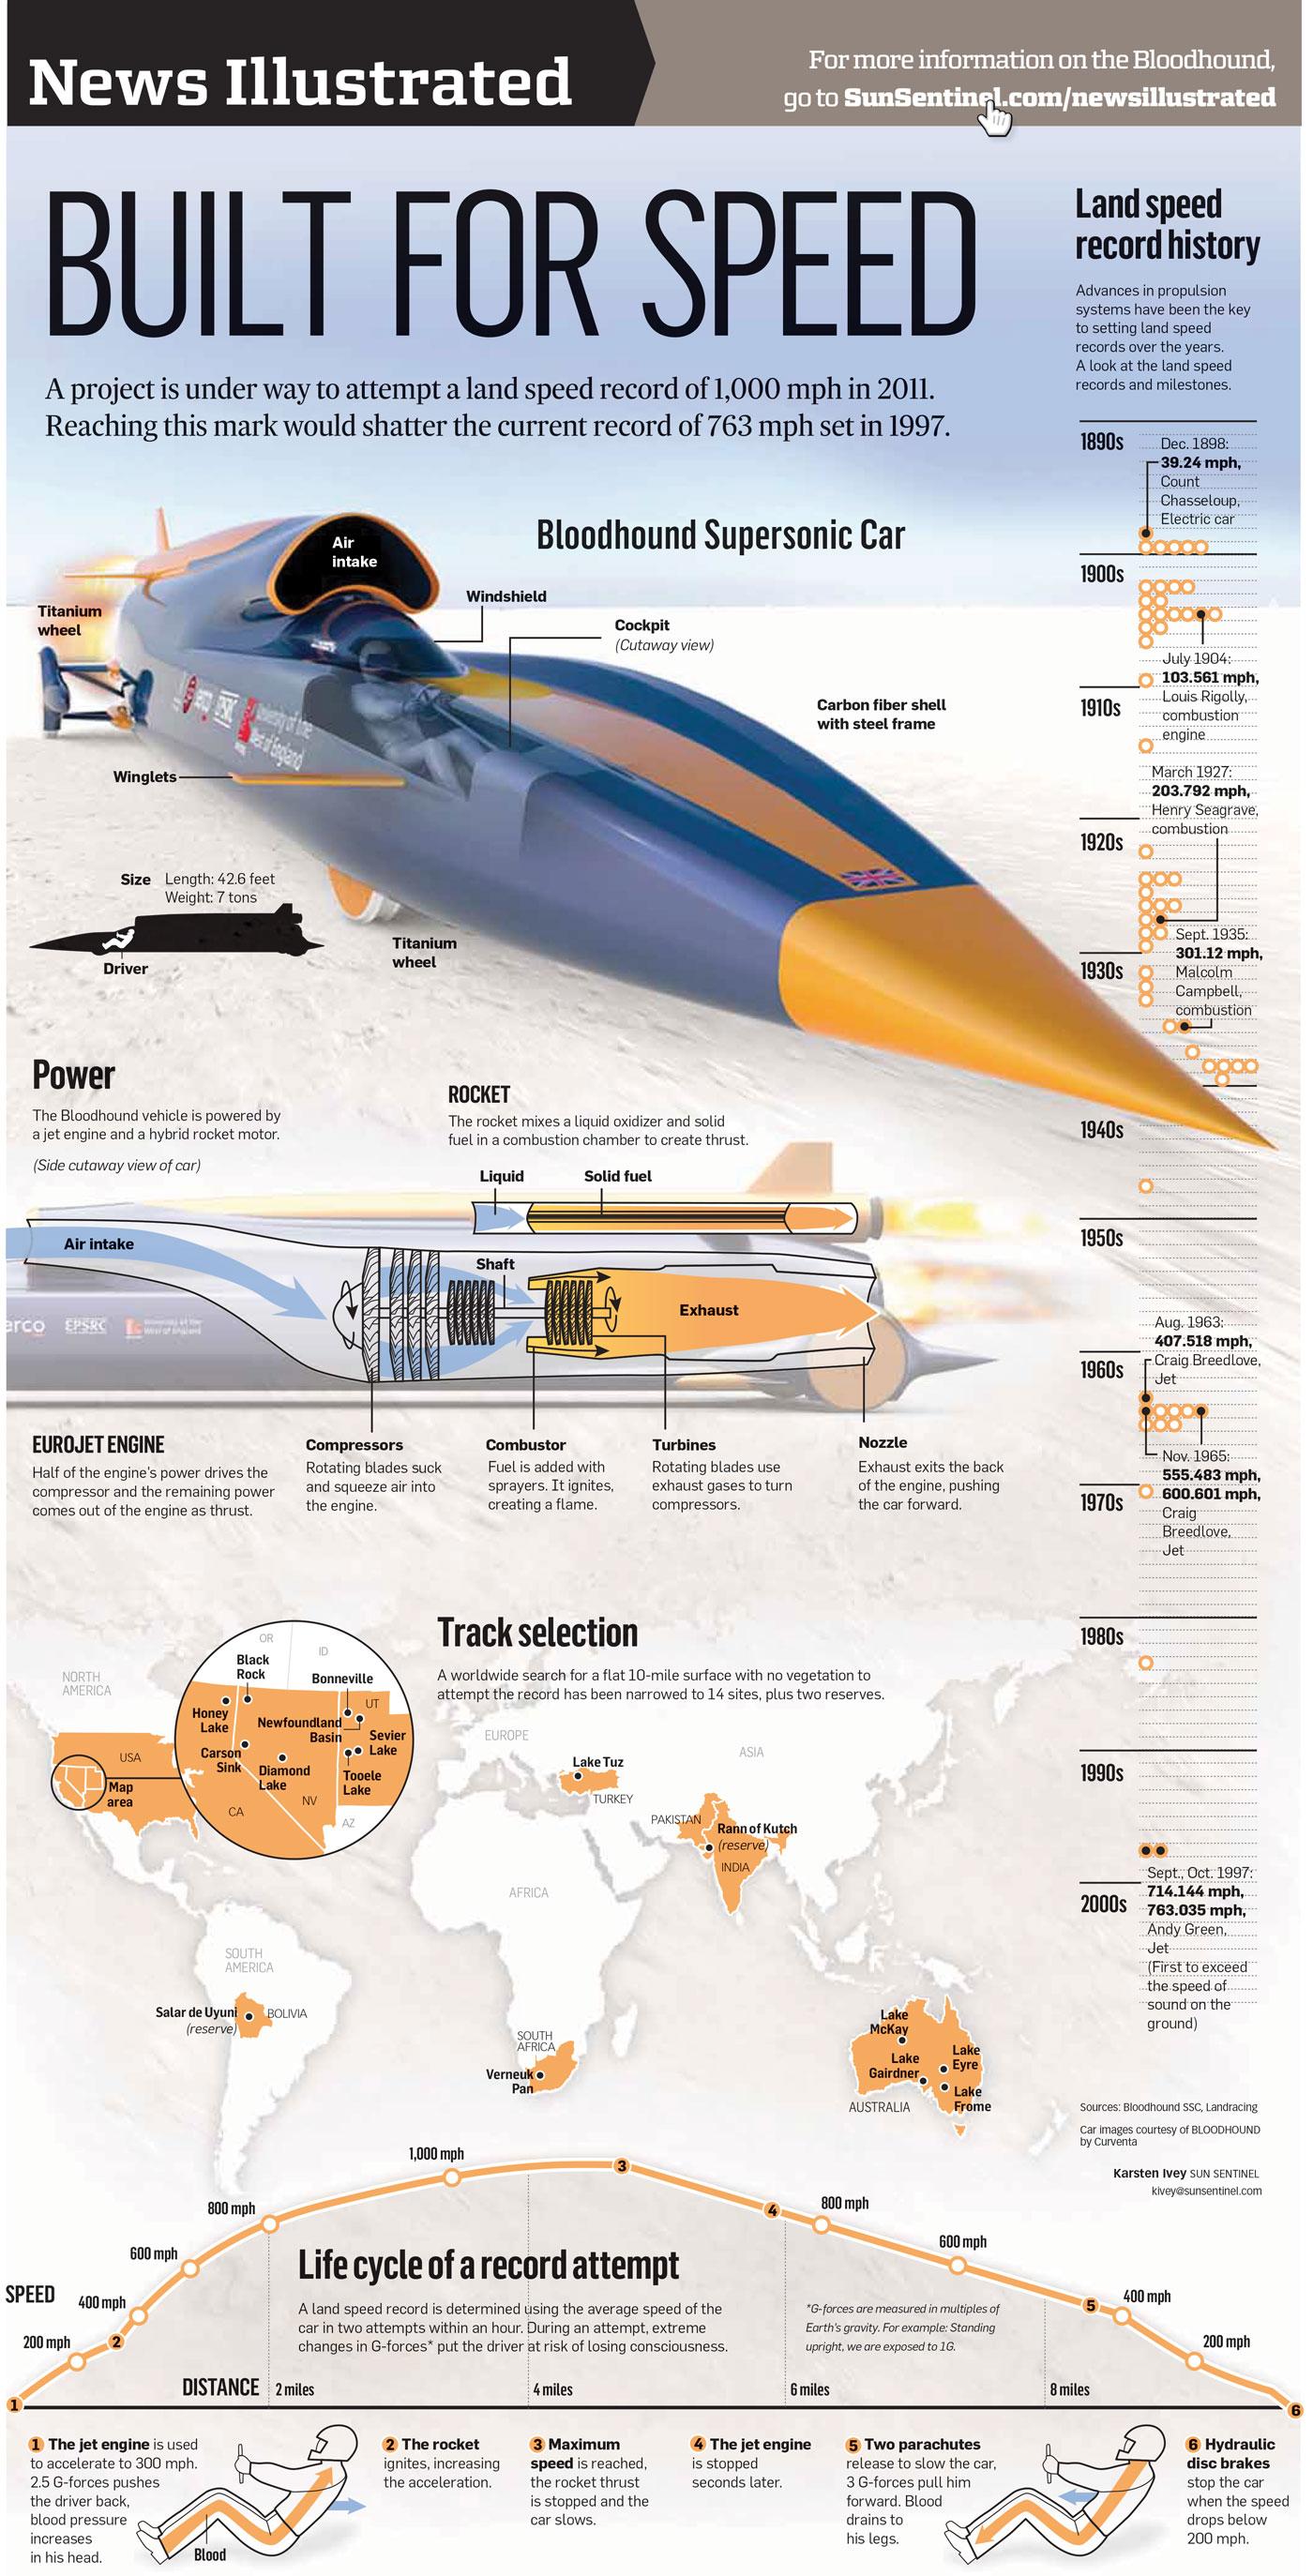 Bloodhound Supersonic Car infographic - Karsten Ivey